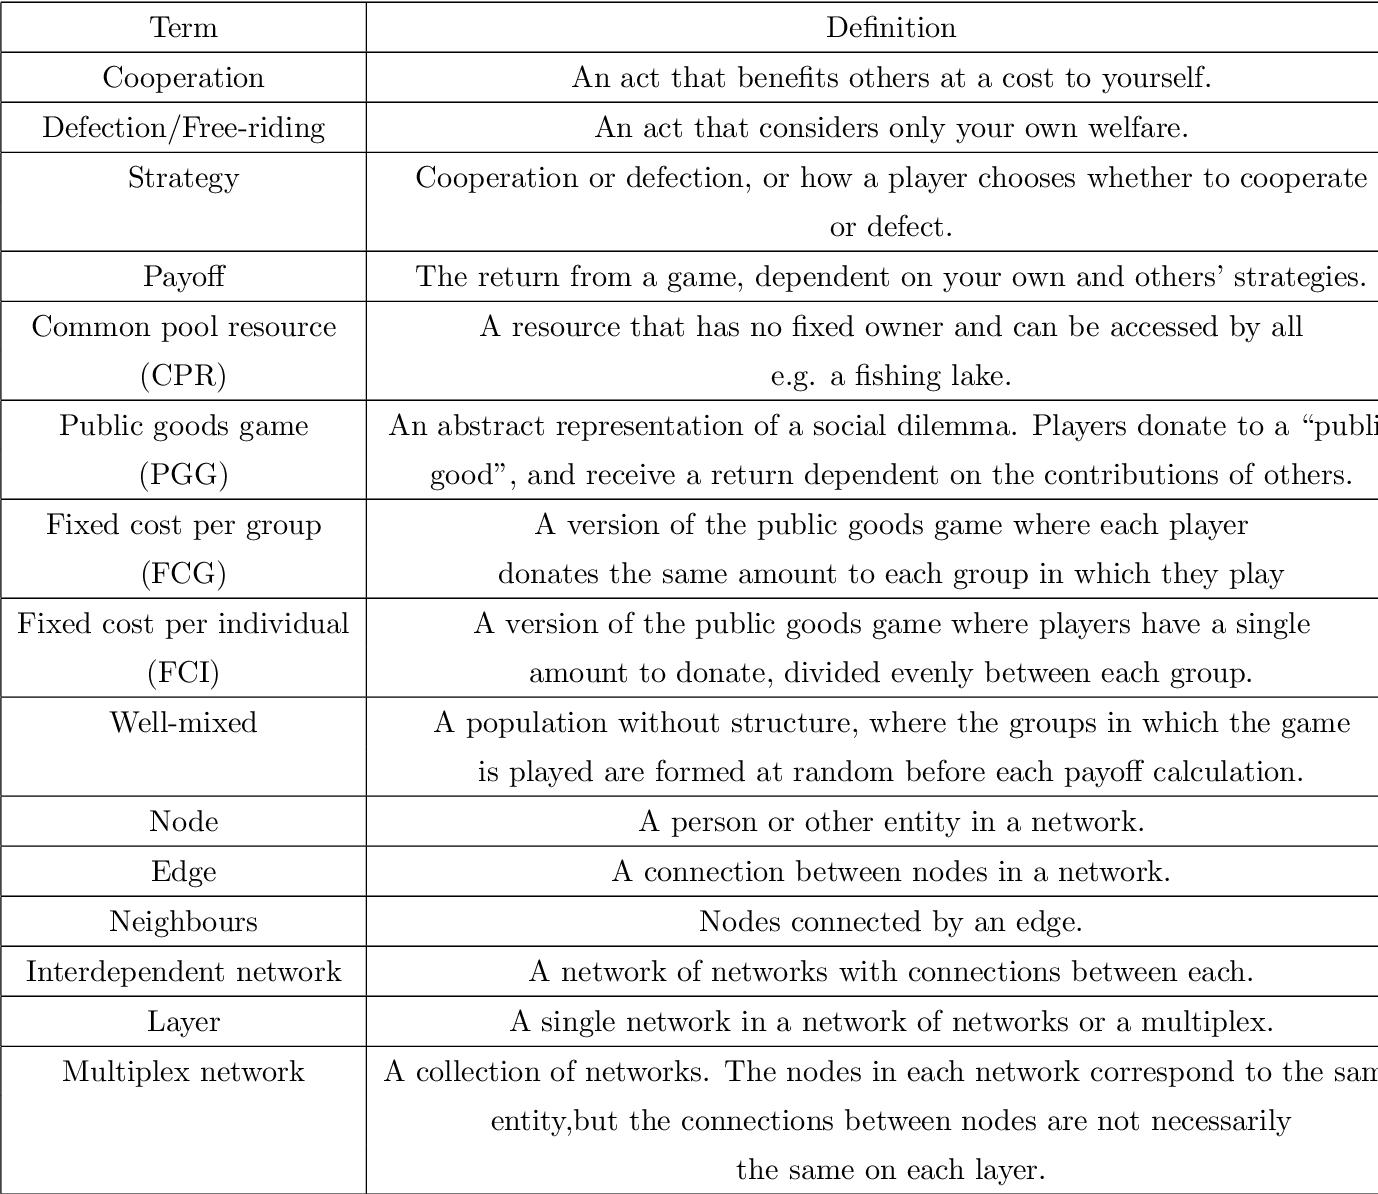 Pdf The Public Goods Game On Multiplex Networks Semantic Scholar